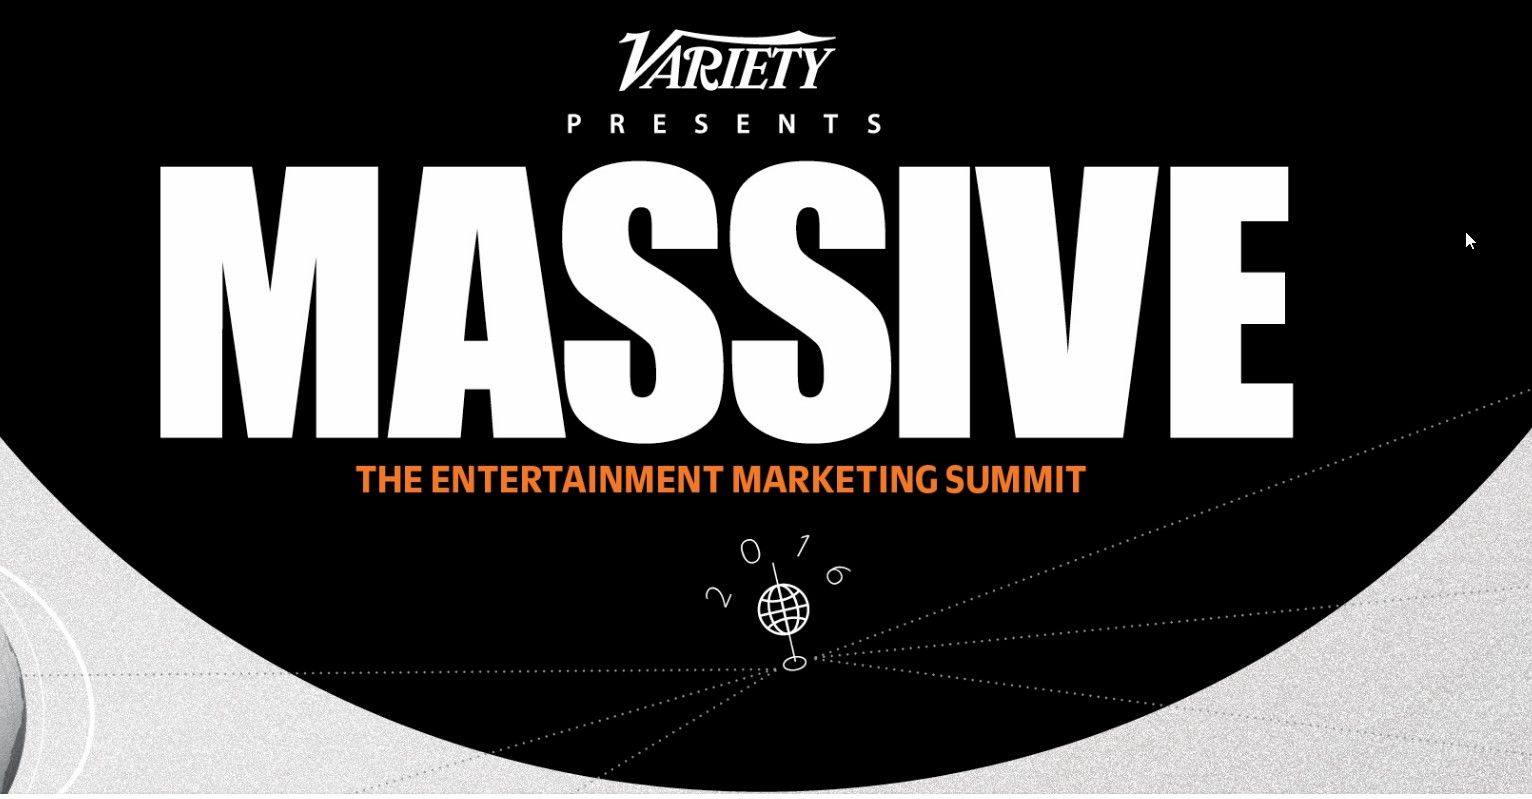 The Entertainment Marketing Summit https://promocionmusical.es/emprendemusica-2017-bases-la-convocatoria/: